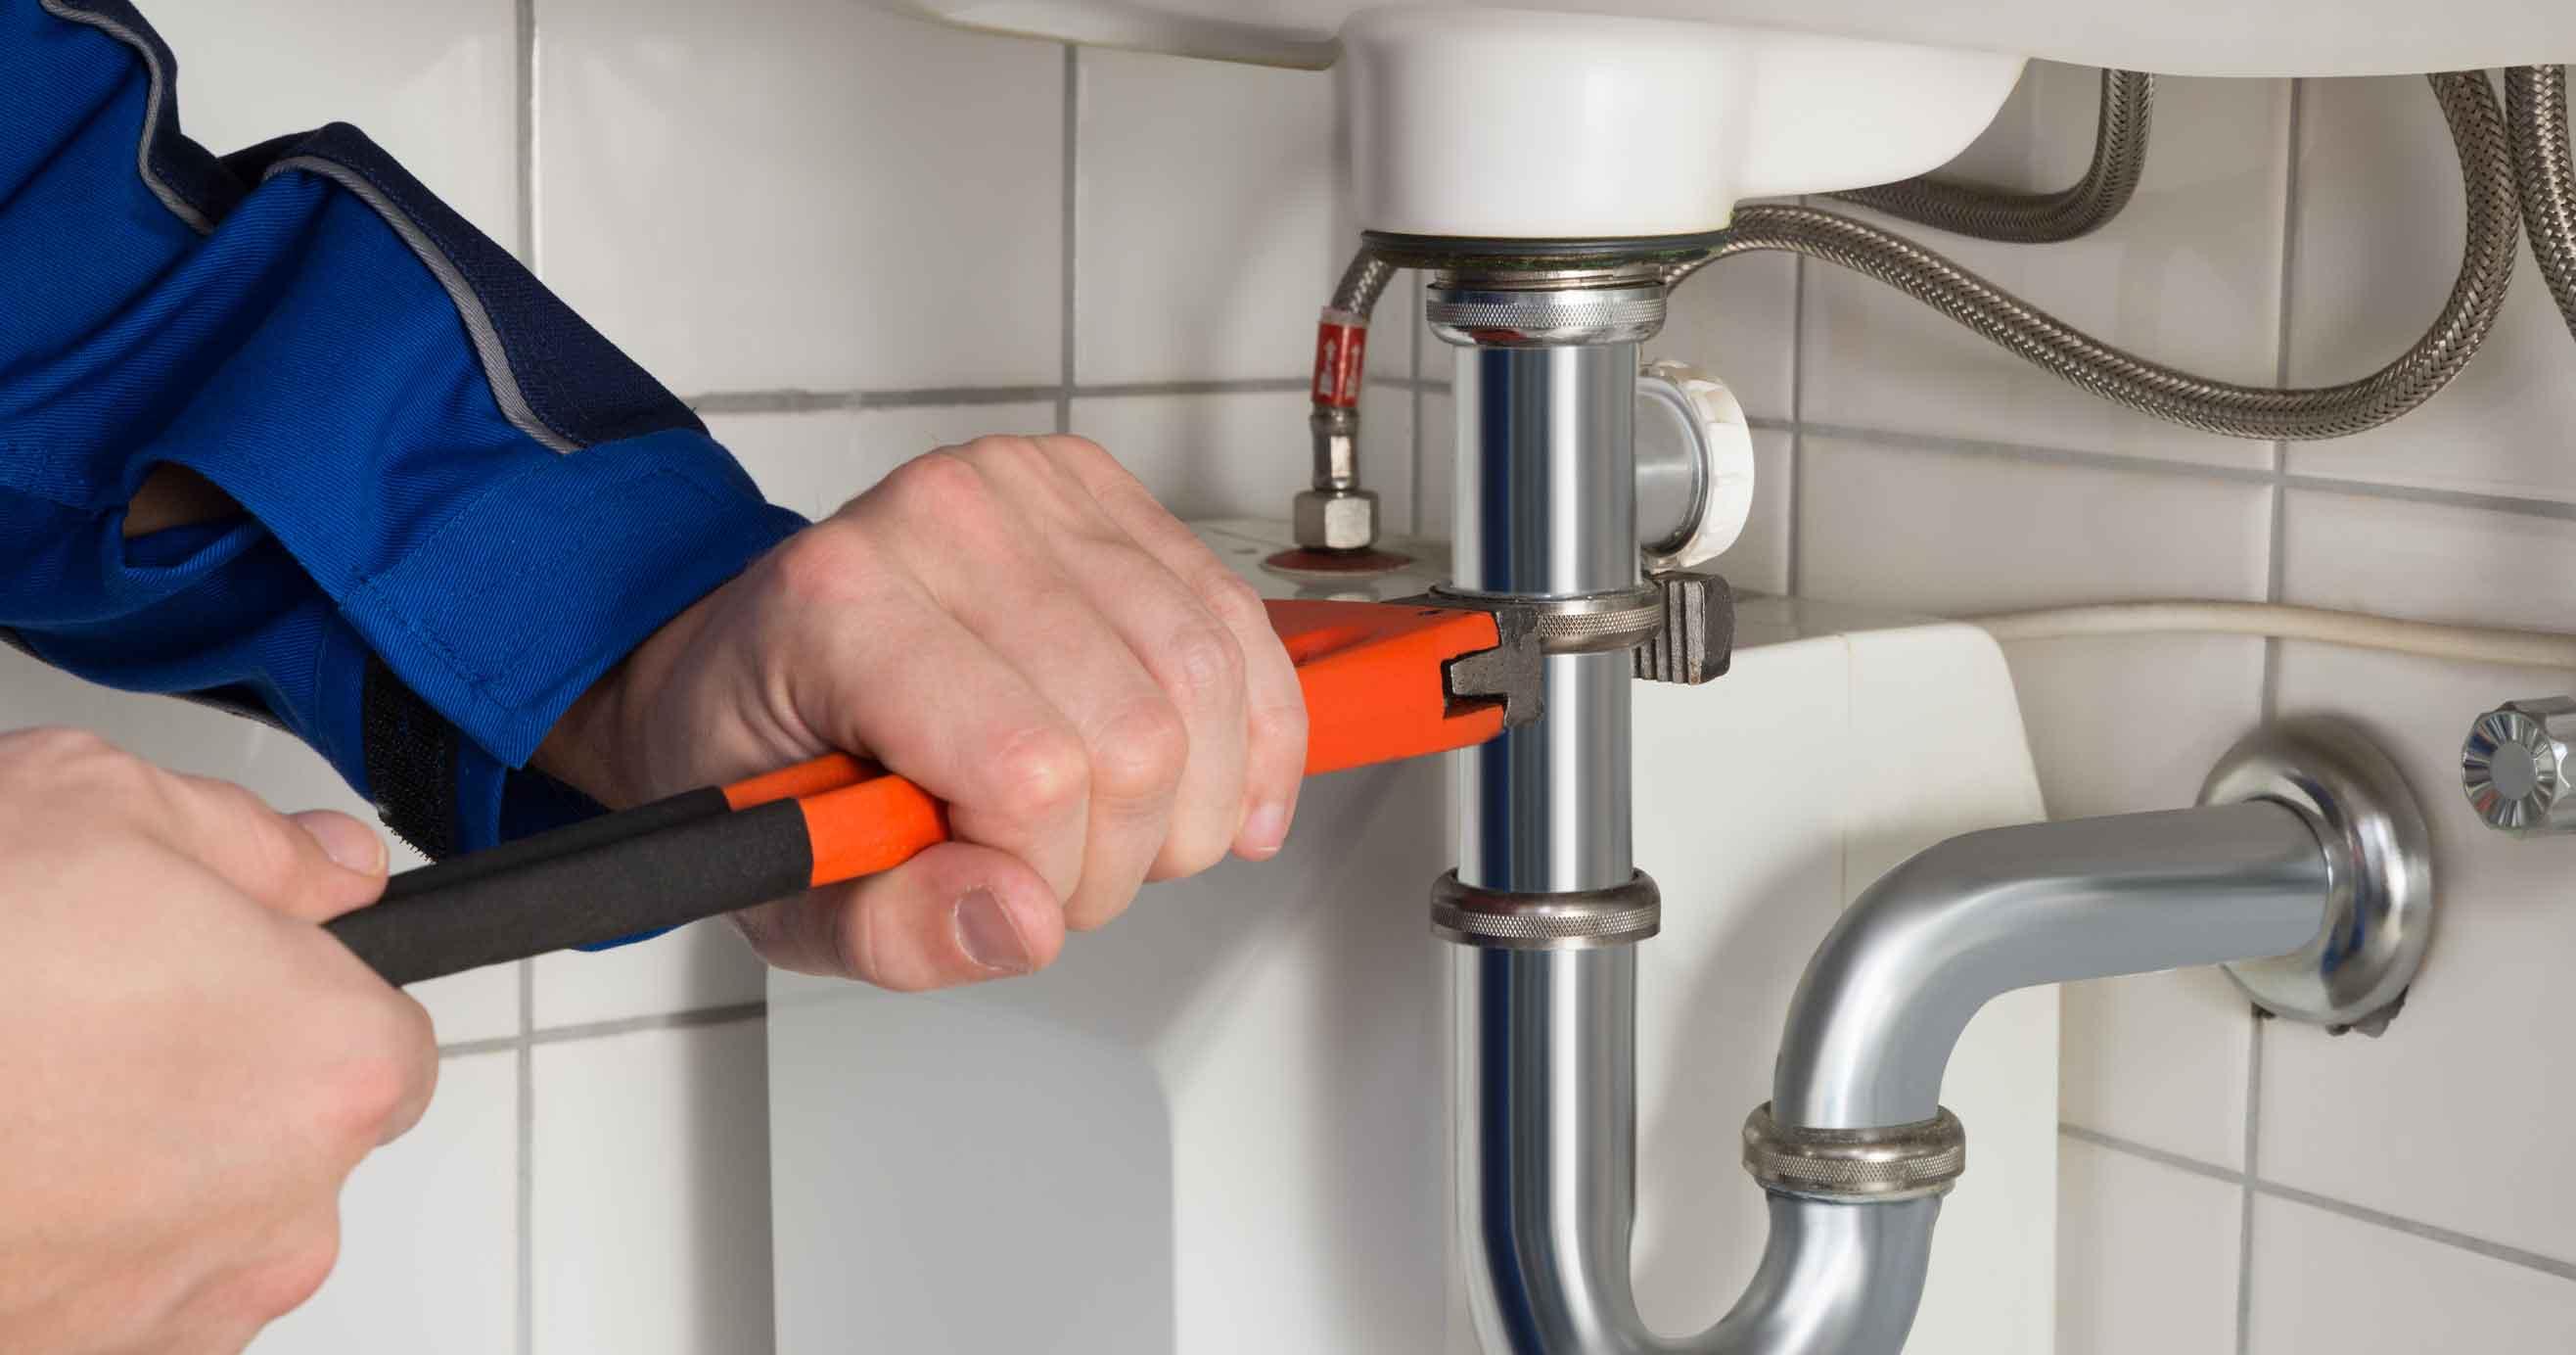 How to fix common plumbing leaks  HomeServe USA